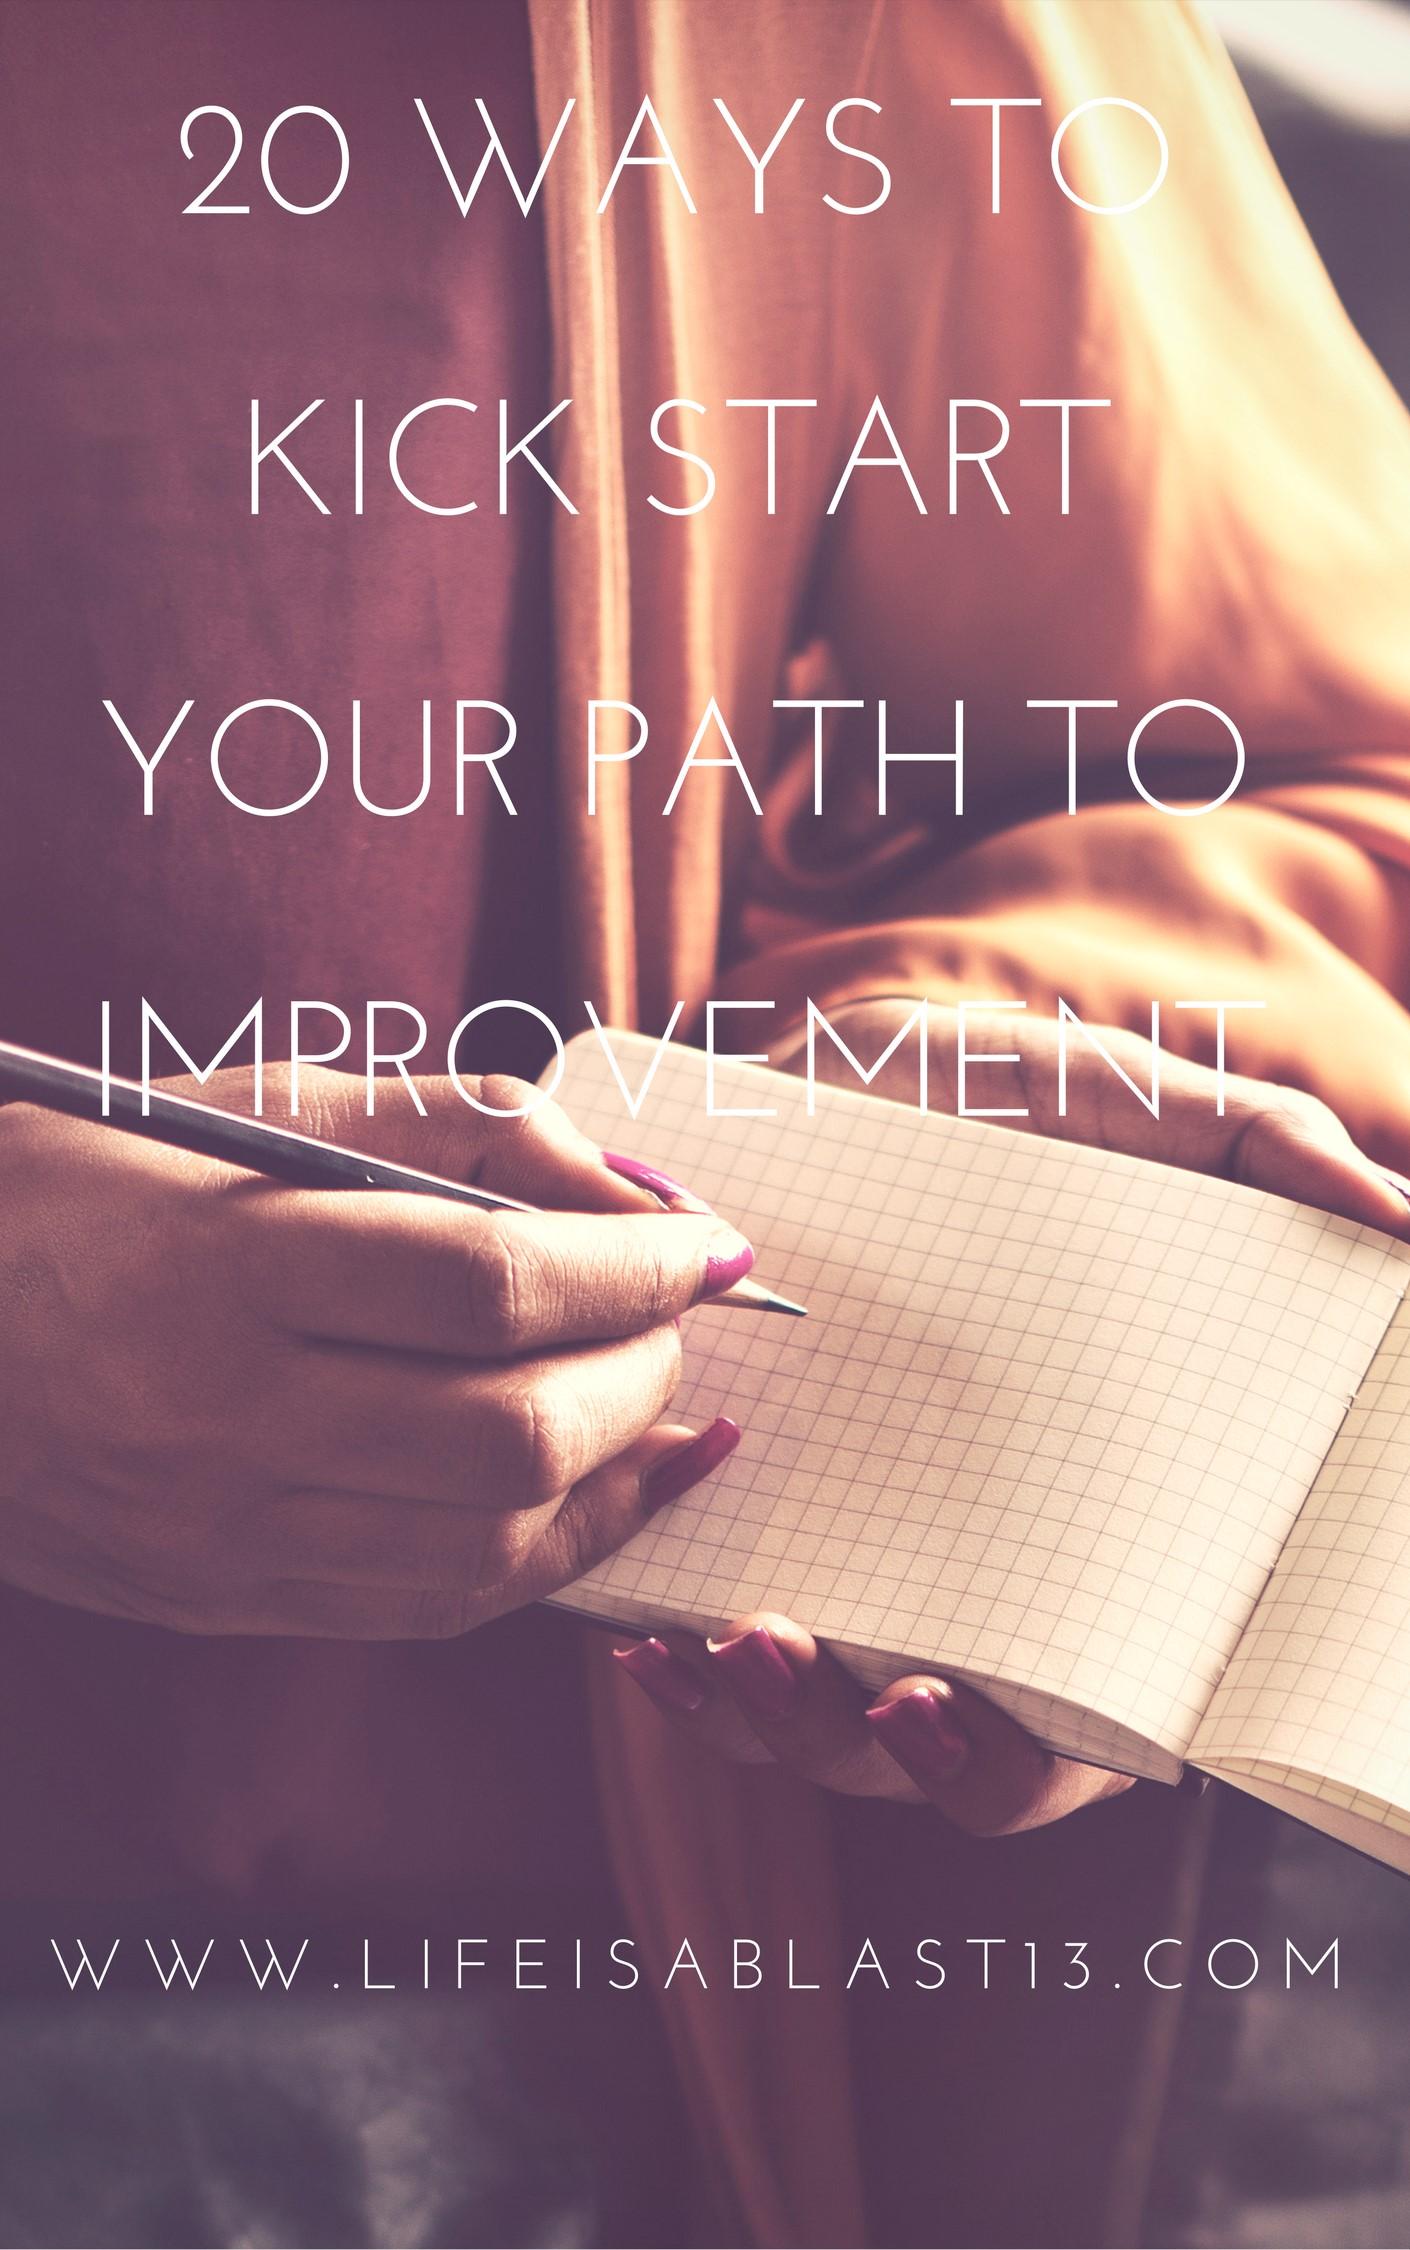 20-Ways-to-Kick-Start-Your-Path-to-Improvement1.jpeg